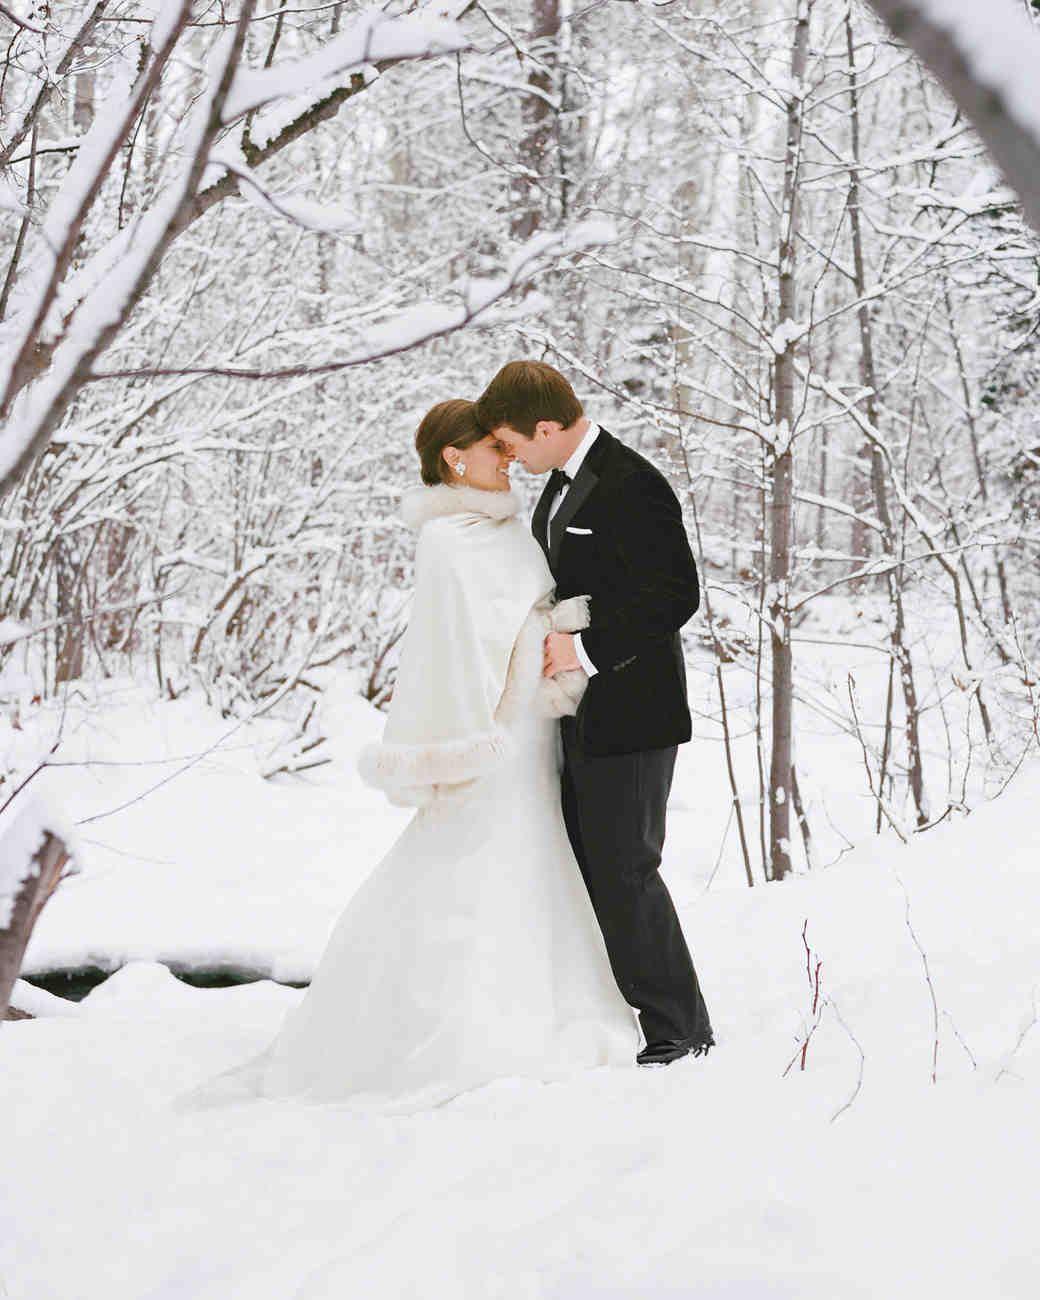 Trendy Velvet Accessories To Wear A Winter Wedding